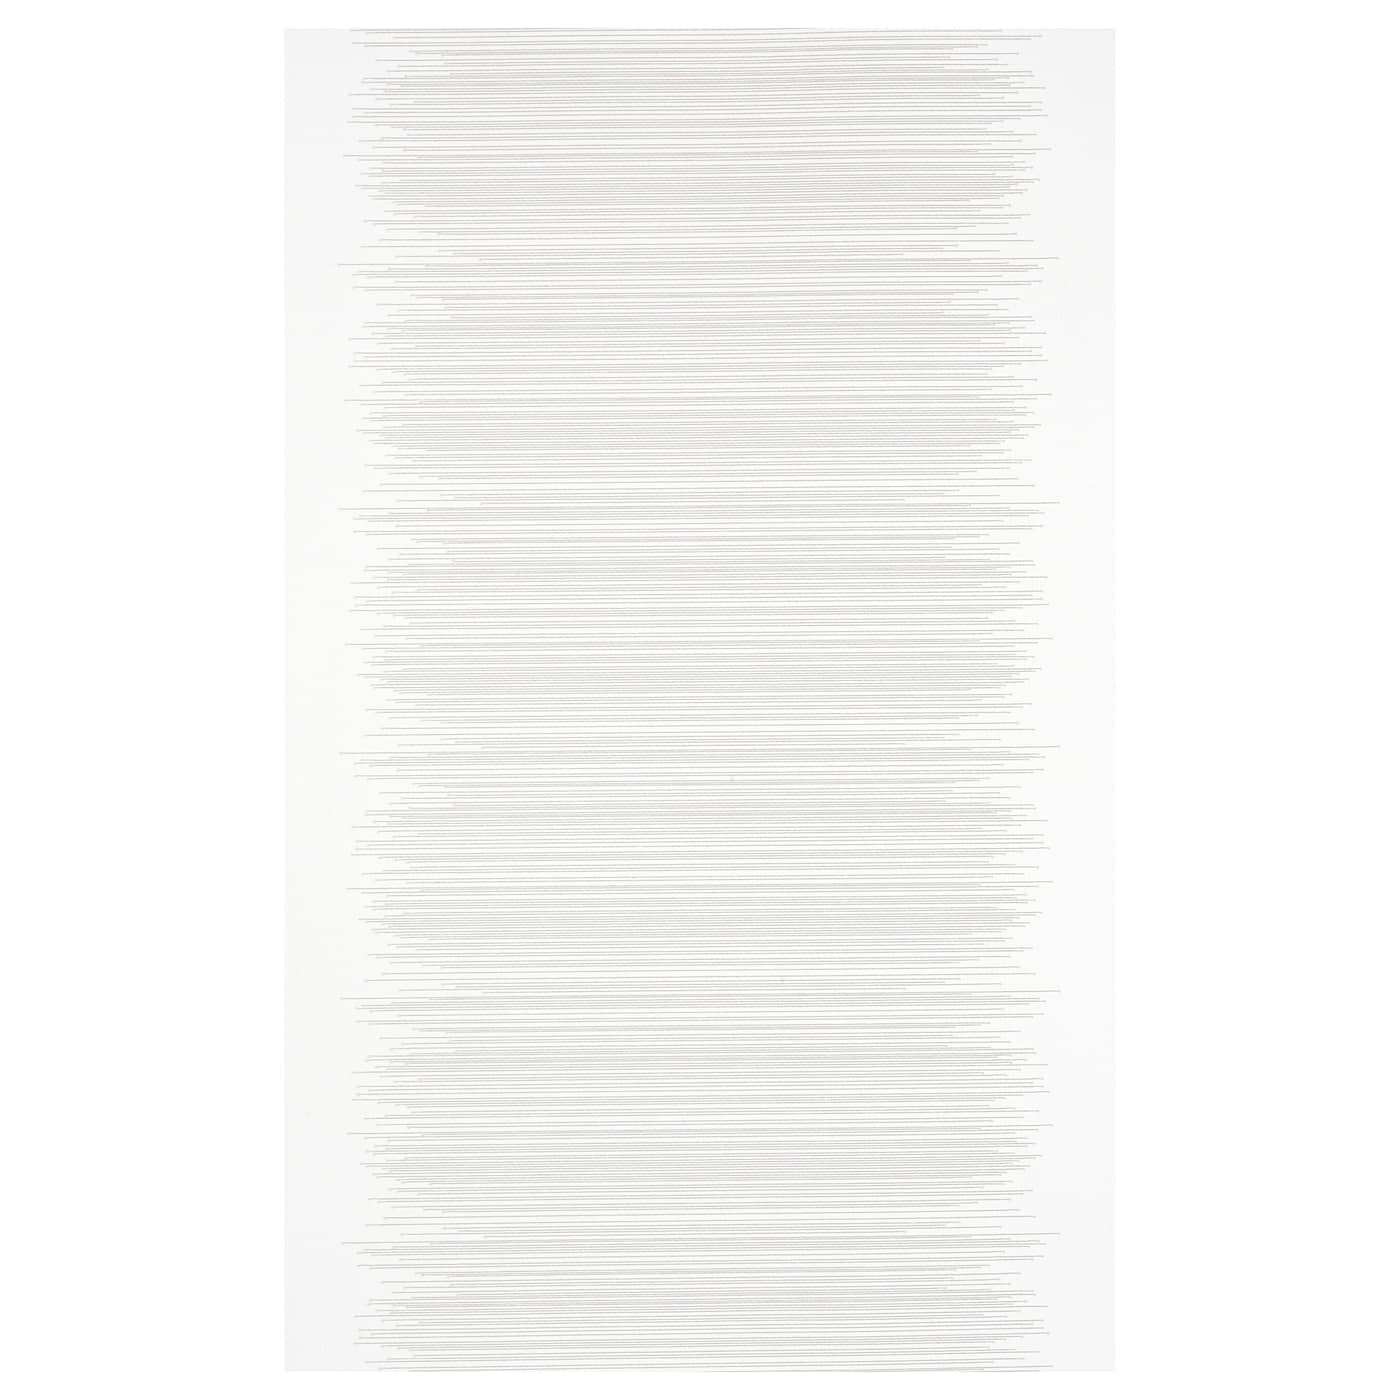 Vattenax panneau blanc blanc 60x300 cm ikea - Panneau agglomere blanc ...